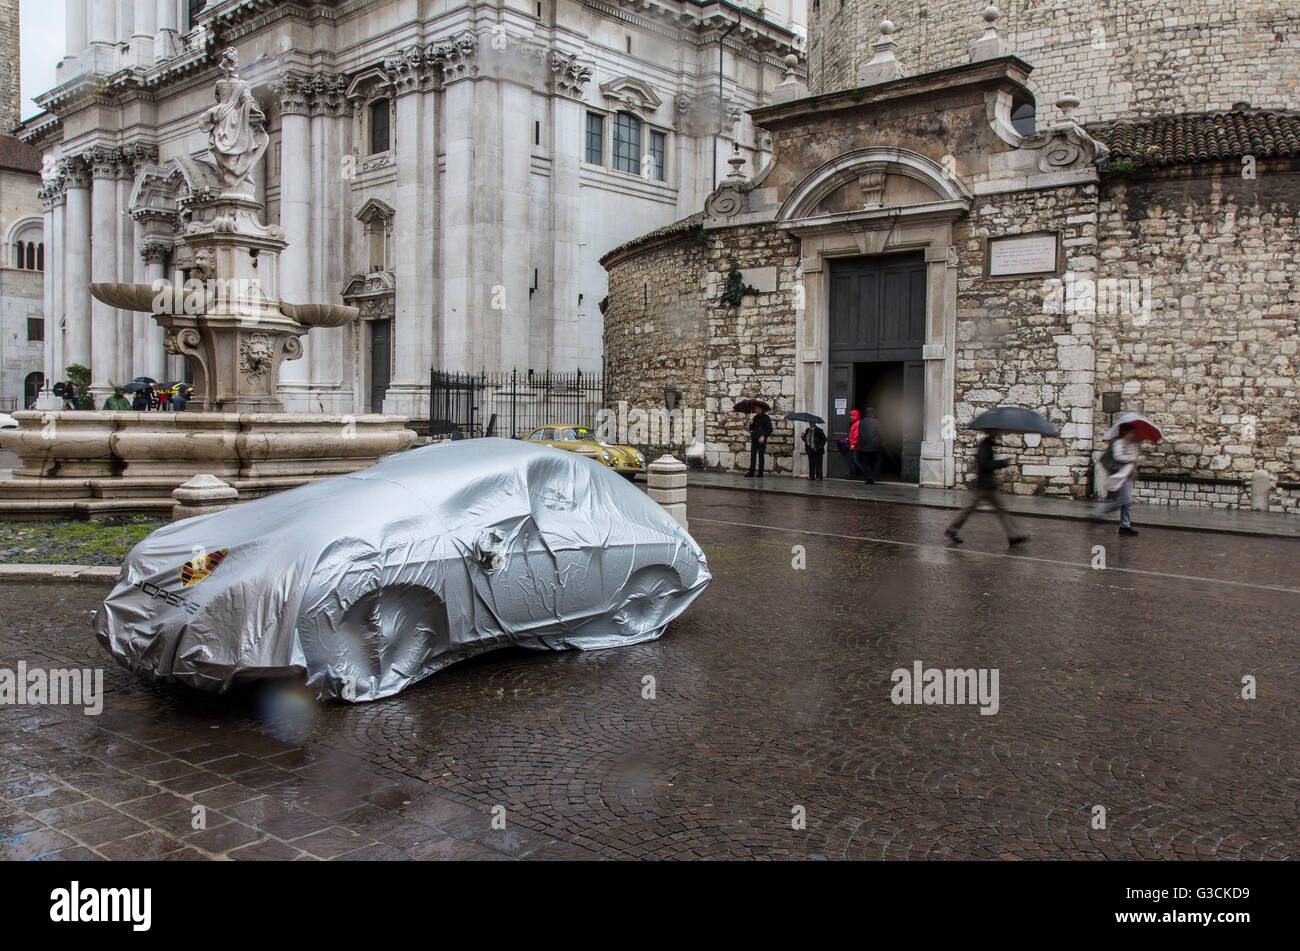 Car in storm, cover, rain, Mille Miglia - Stock Image